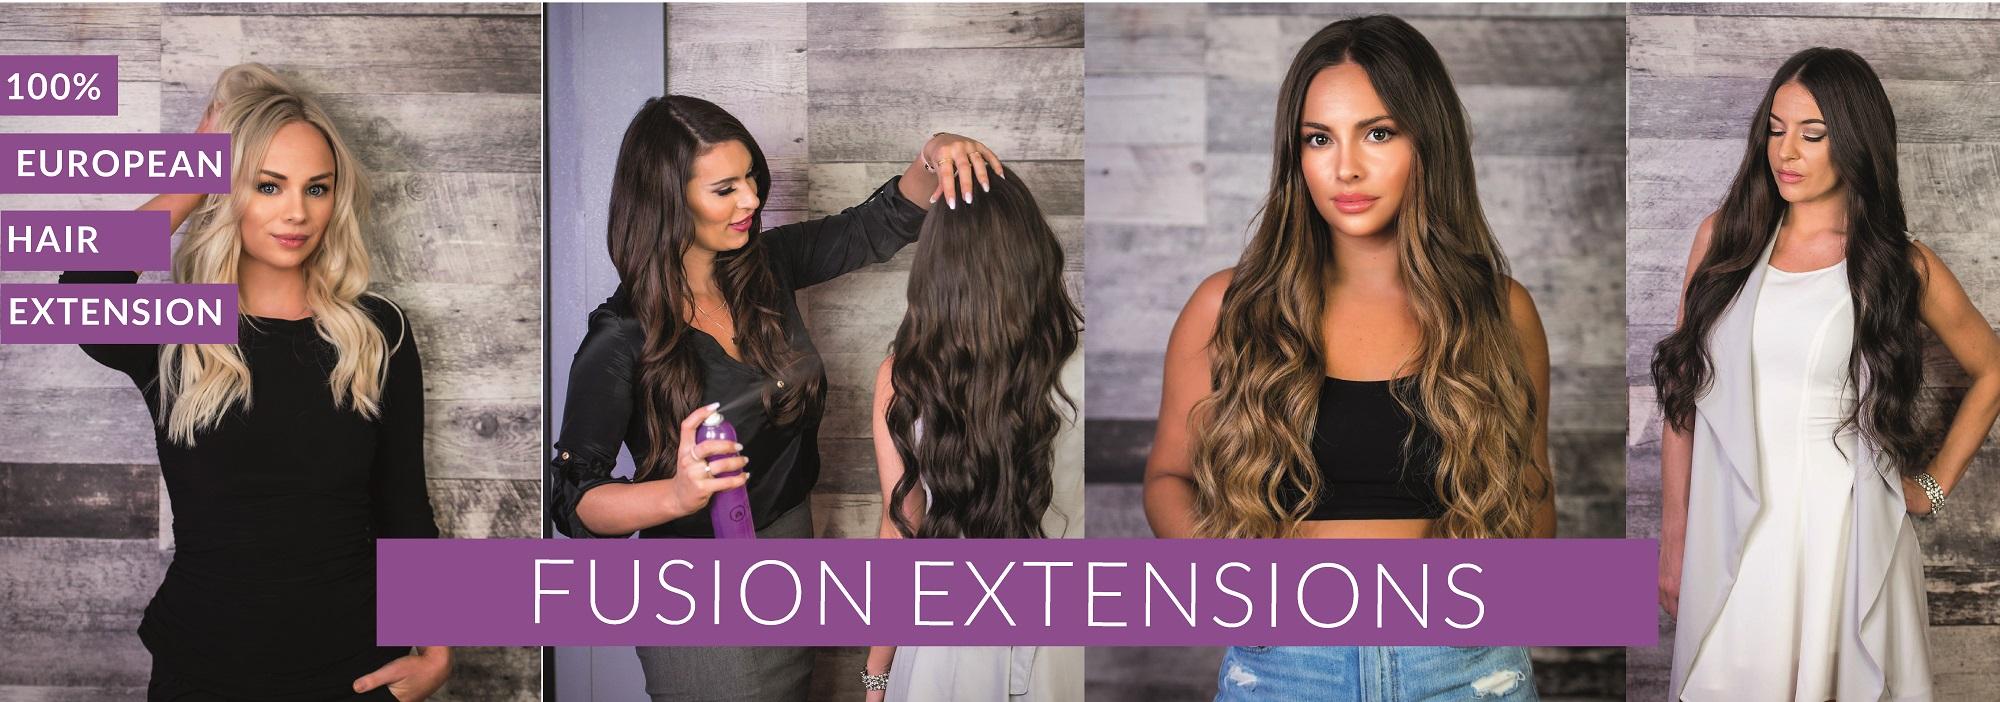 fusion-hair-extensions-banner-2018.jpg